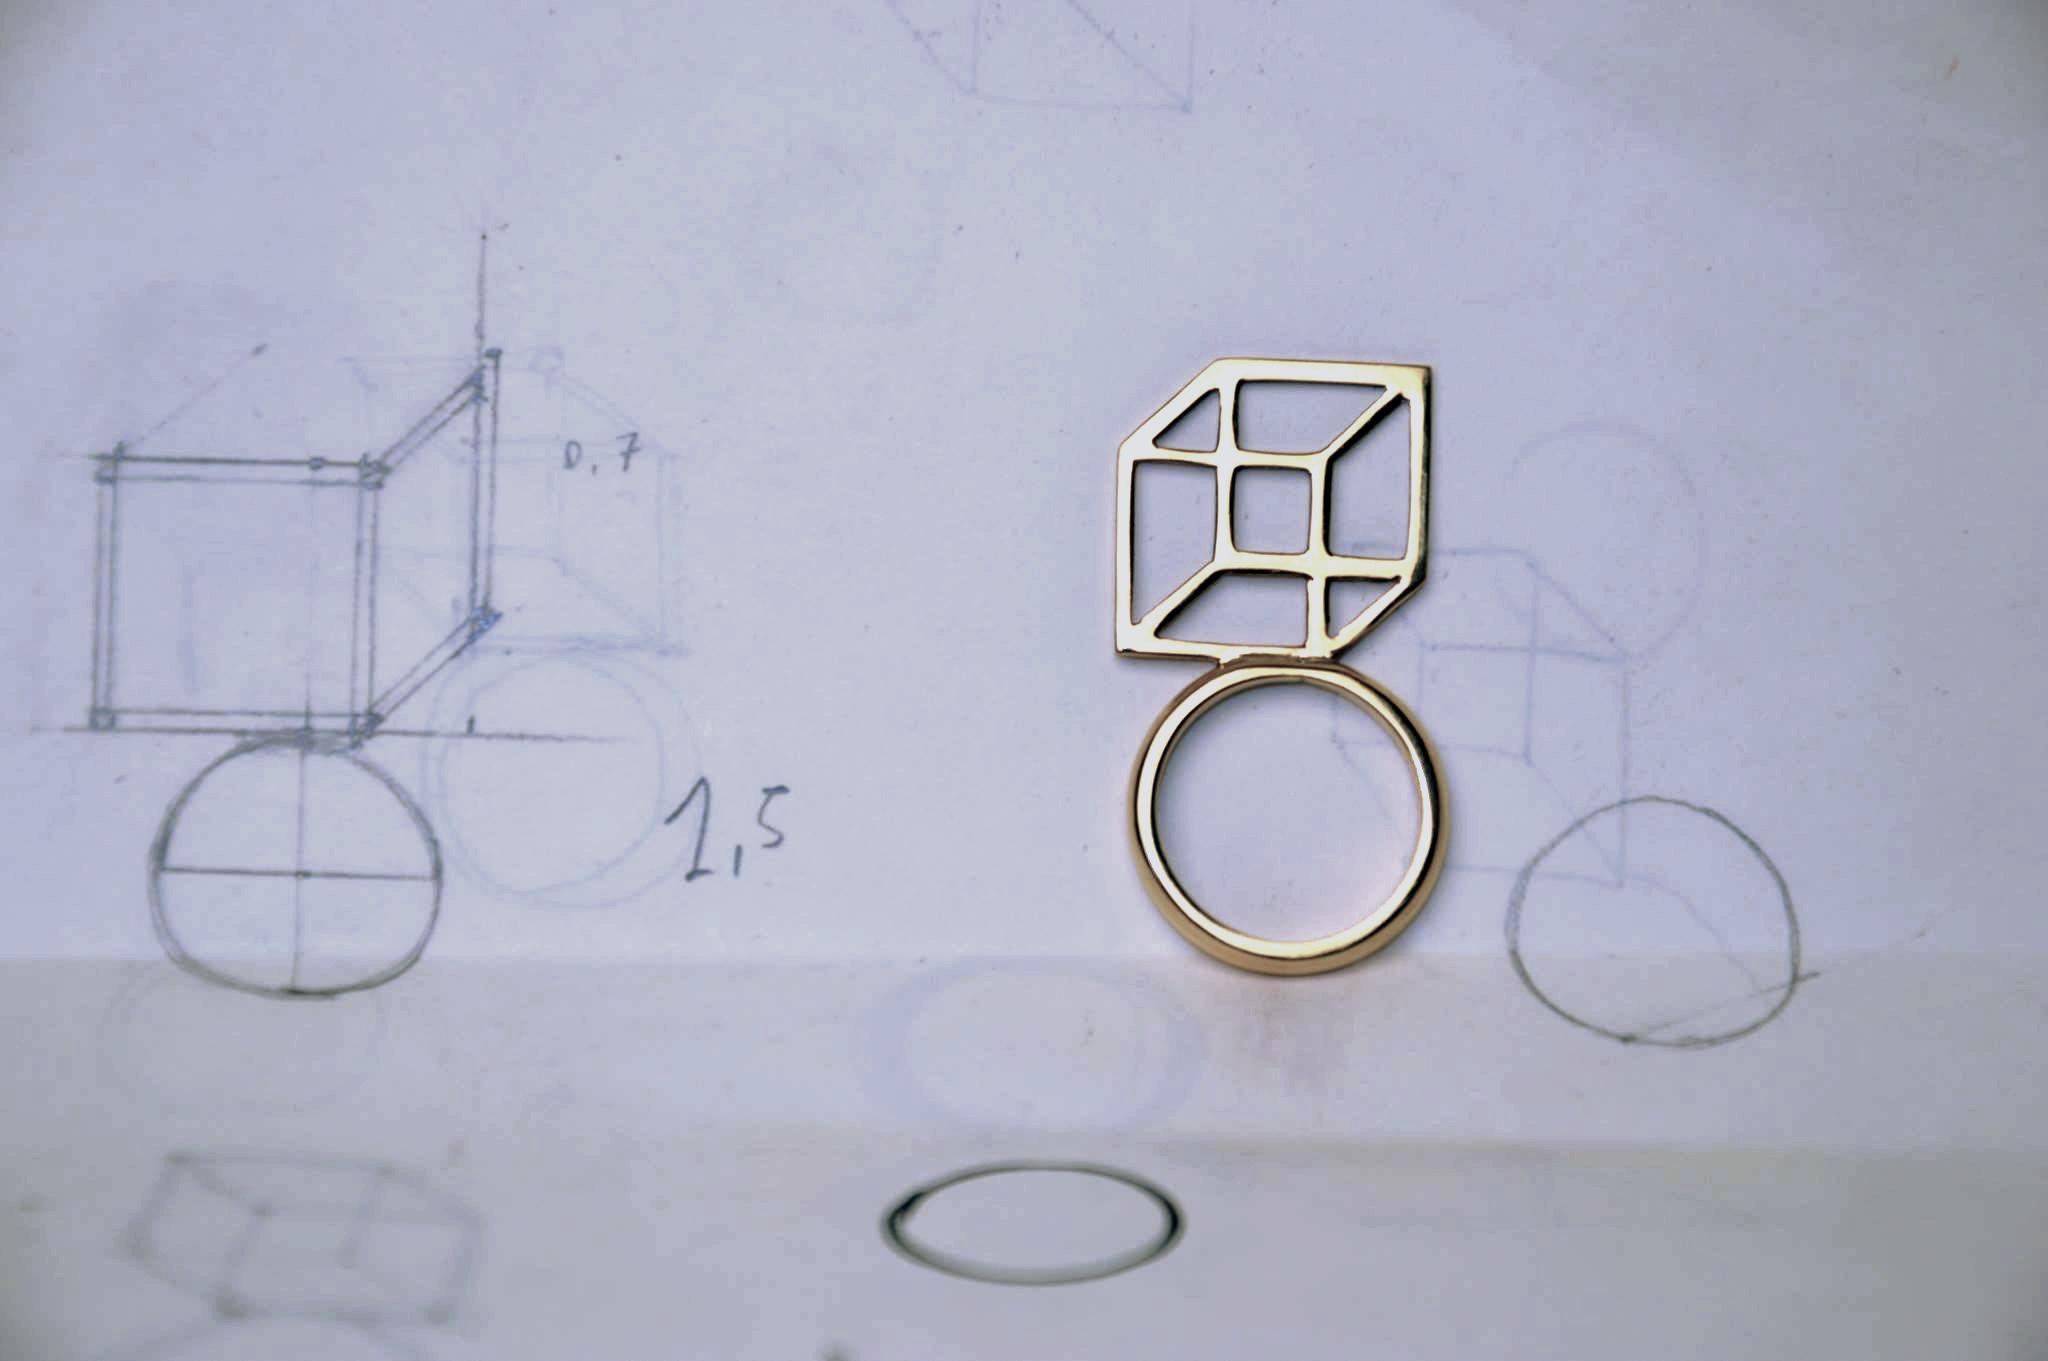 Cube ring 1 sketch.jpg